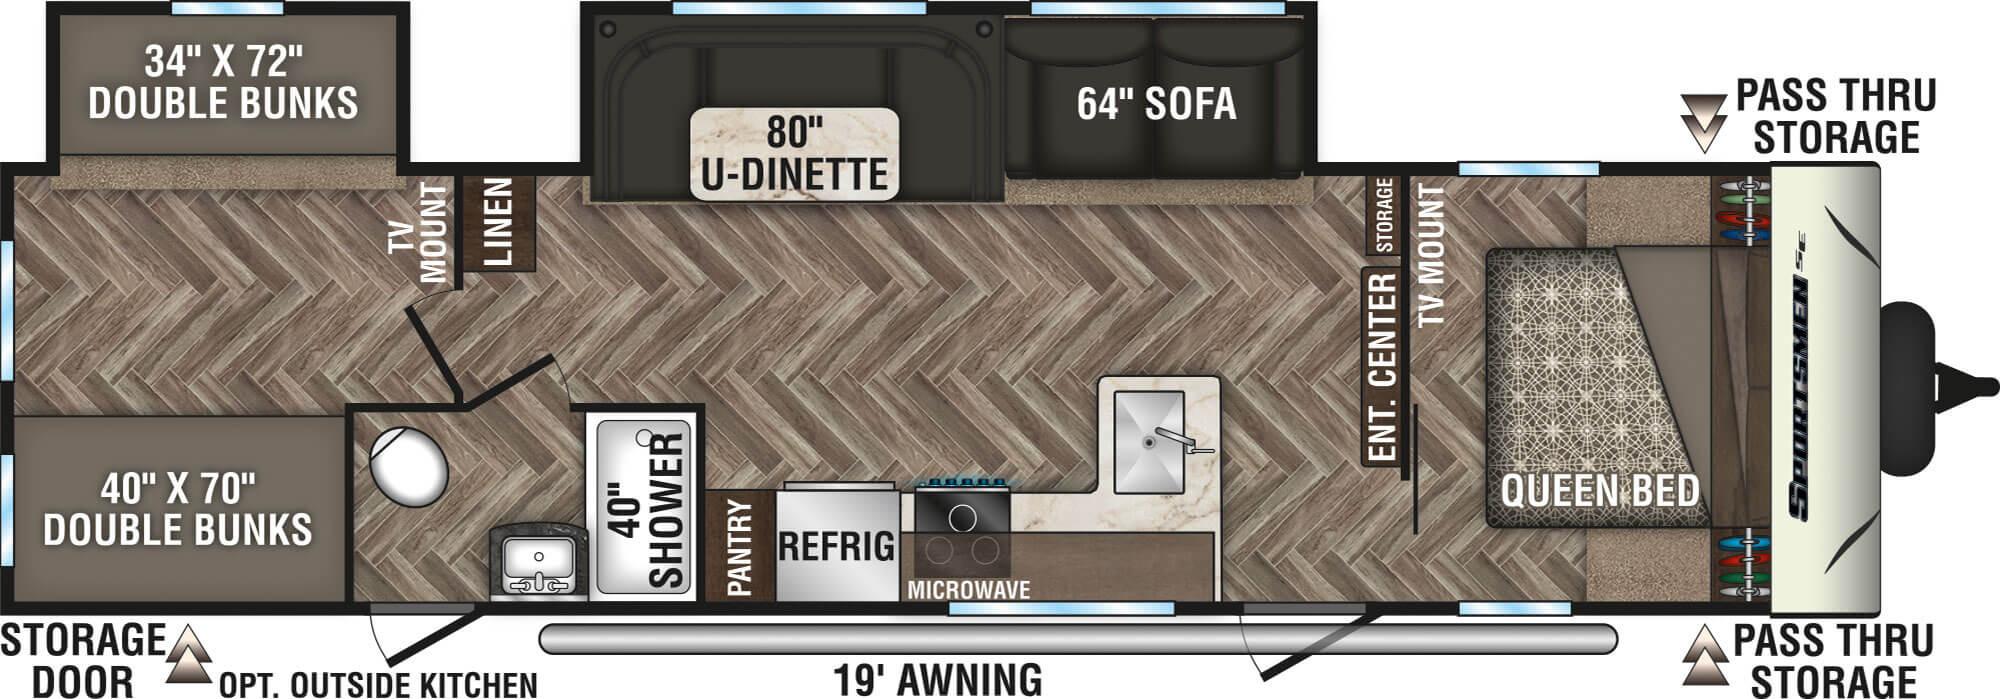 View Floor Plan for 2021 K-Z RV SPORTSMEN SE 312BHSE